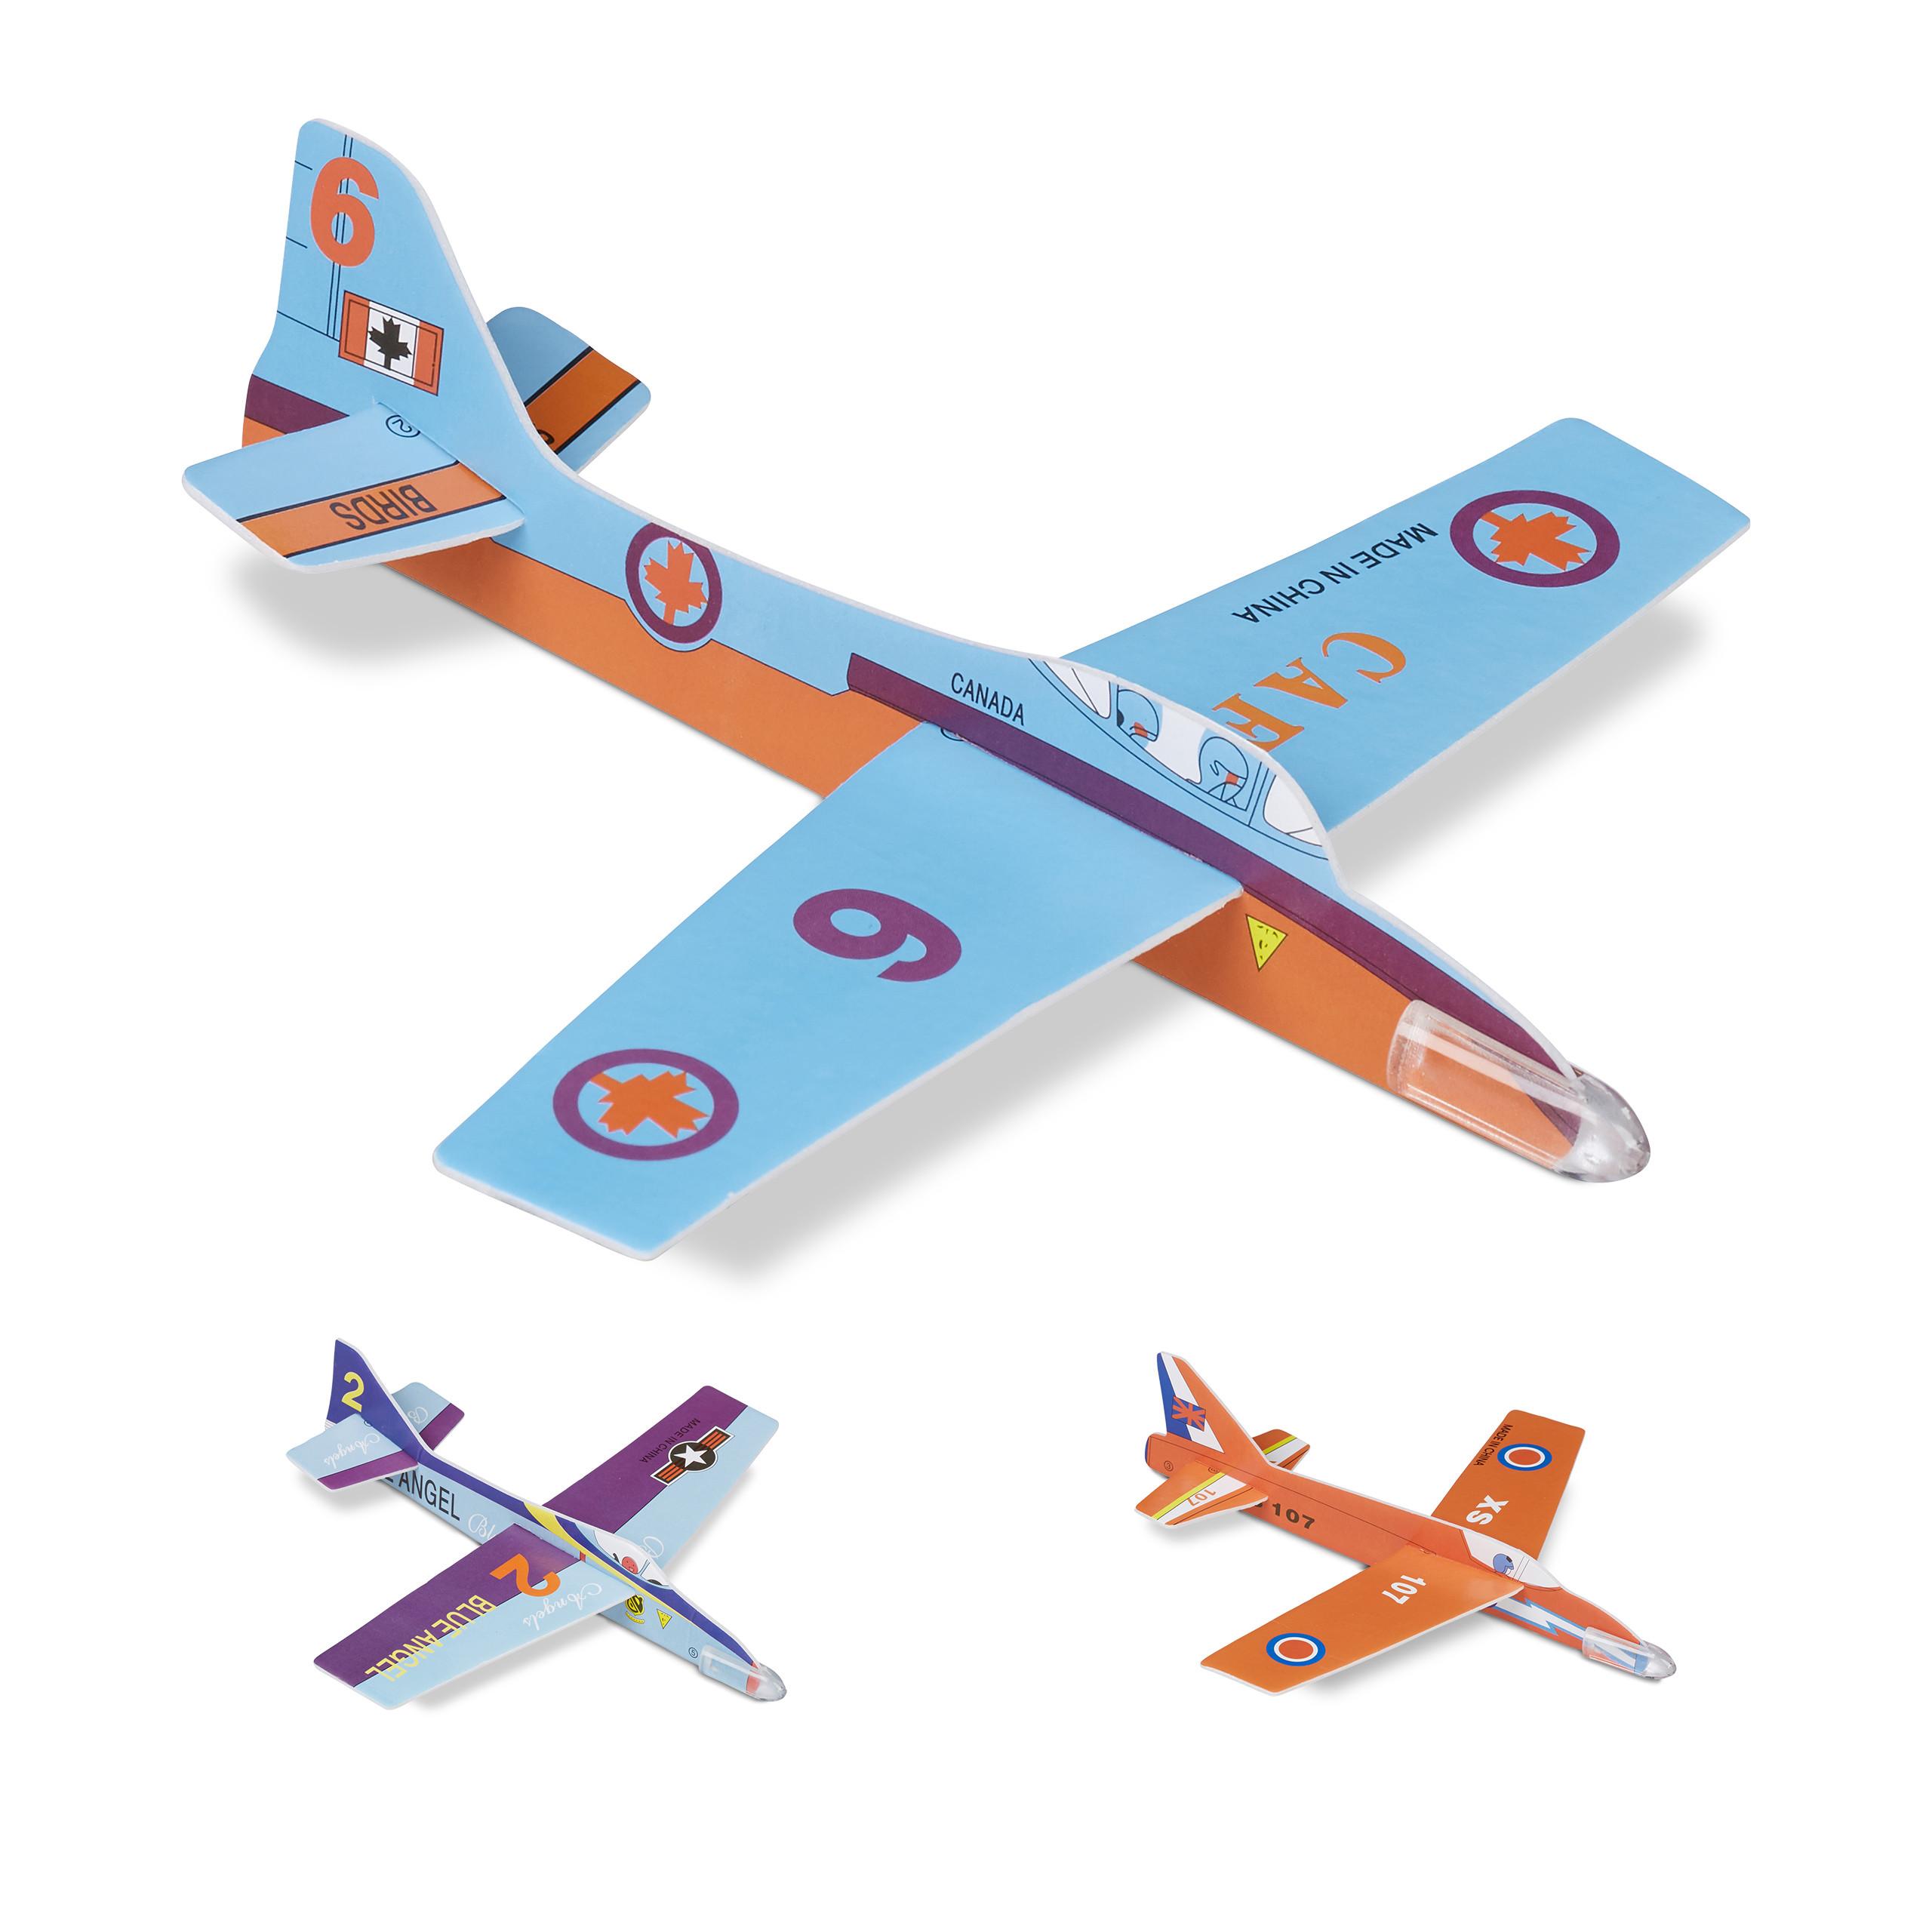 4x Styroporflieger Styropor Flieger Flugzeug NEU